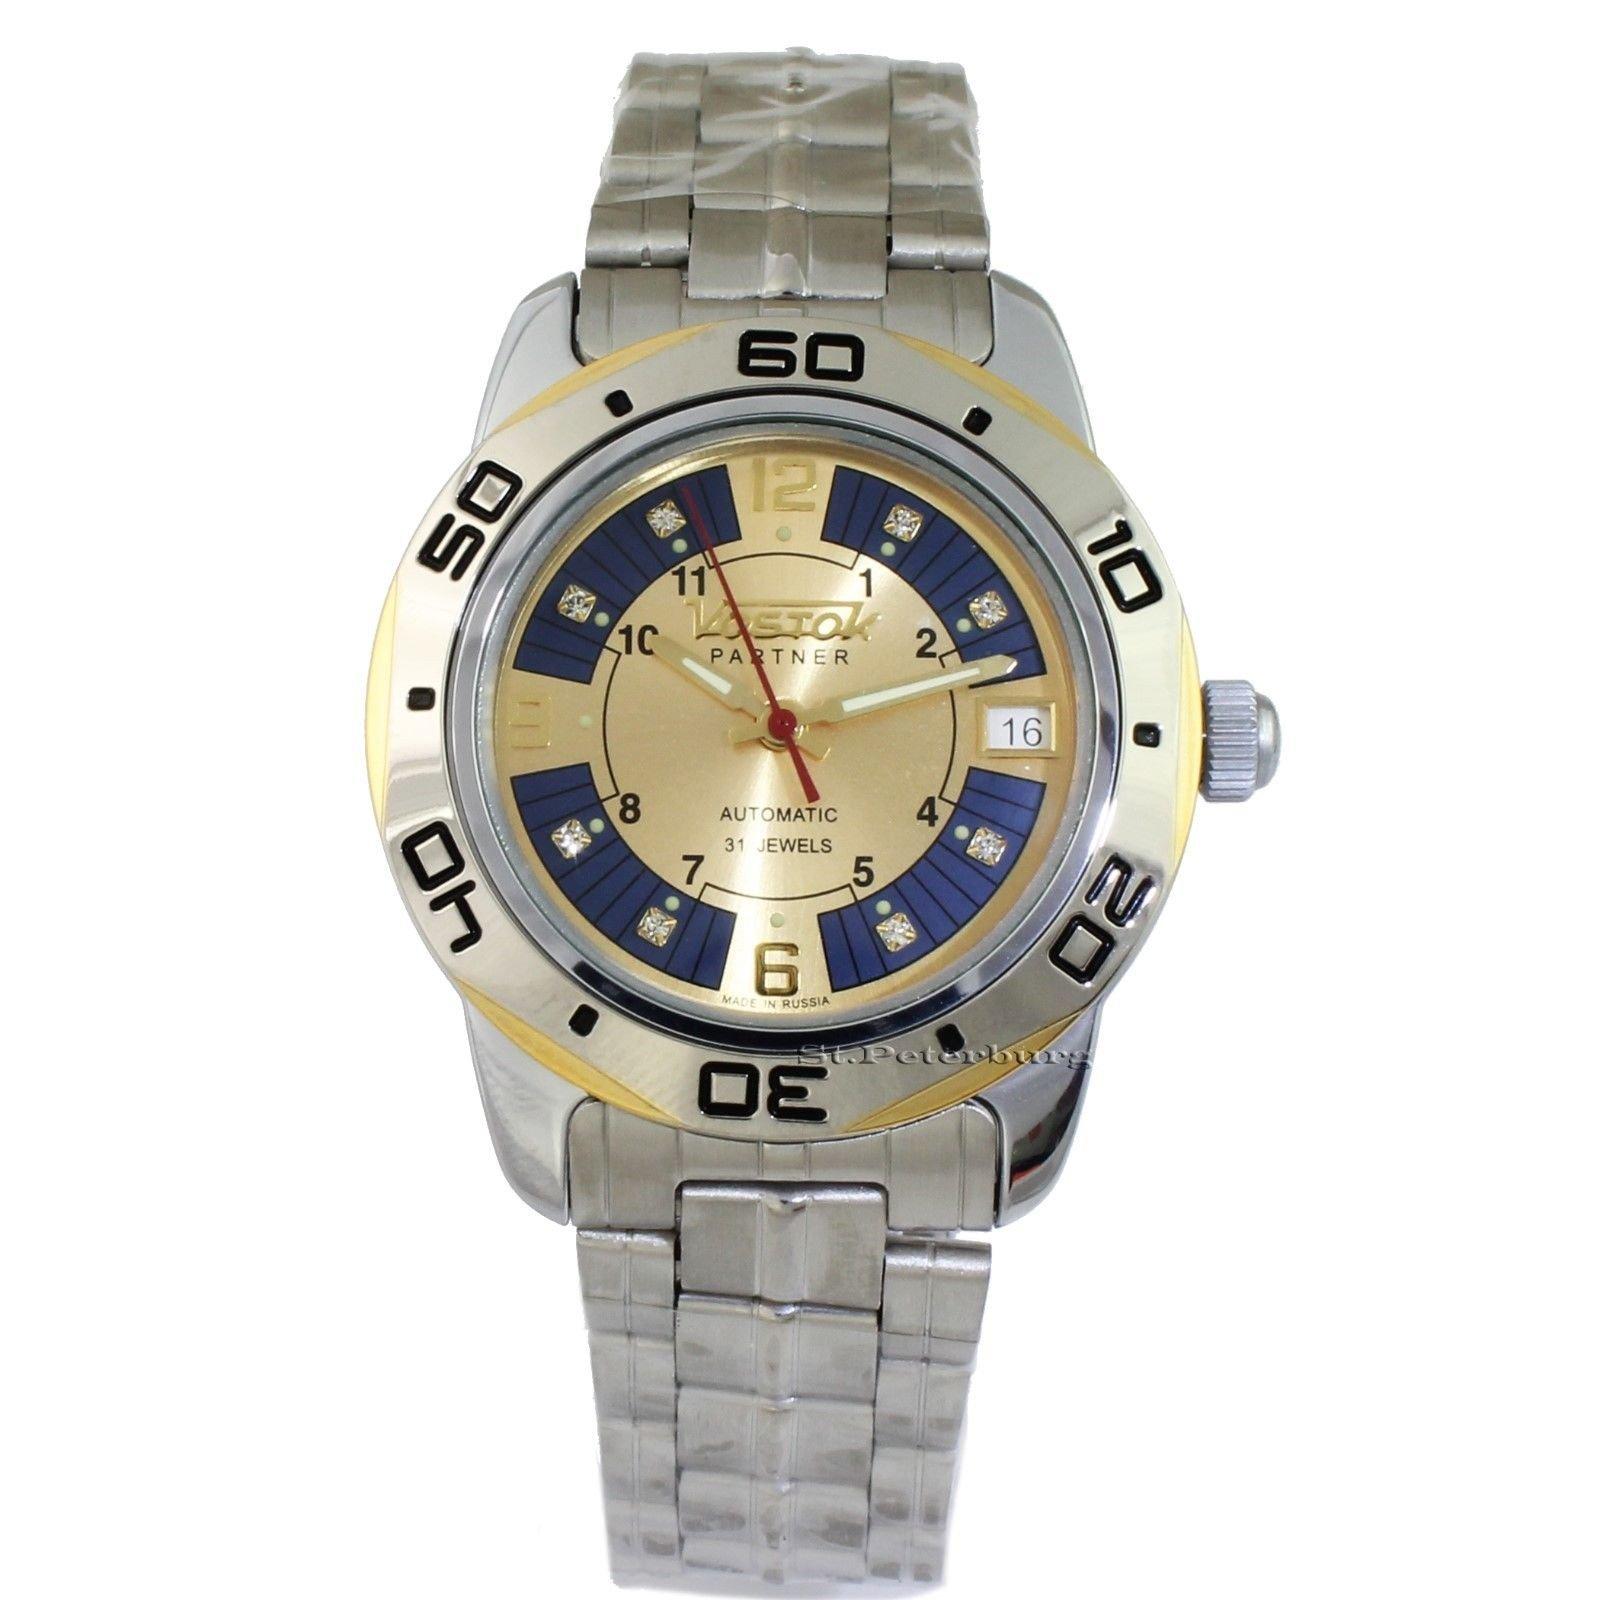 Vostok Partner 291097 / 2414b Mechanical Auto Wrist Watch Shockproof Waterpro...